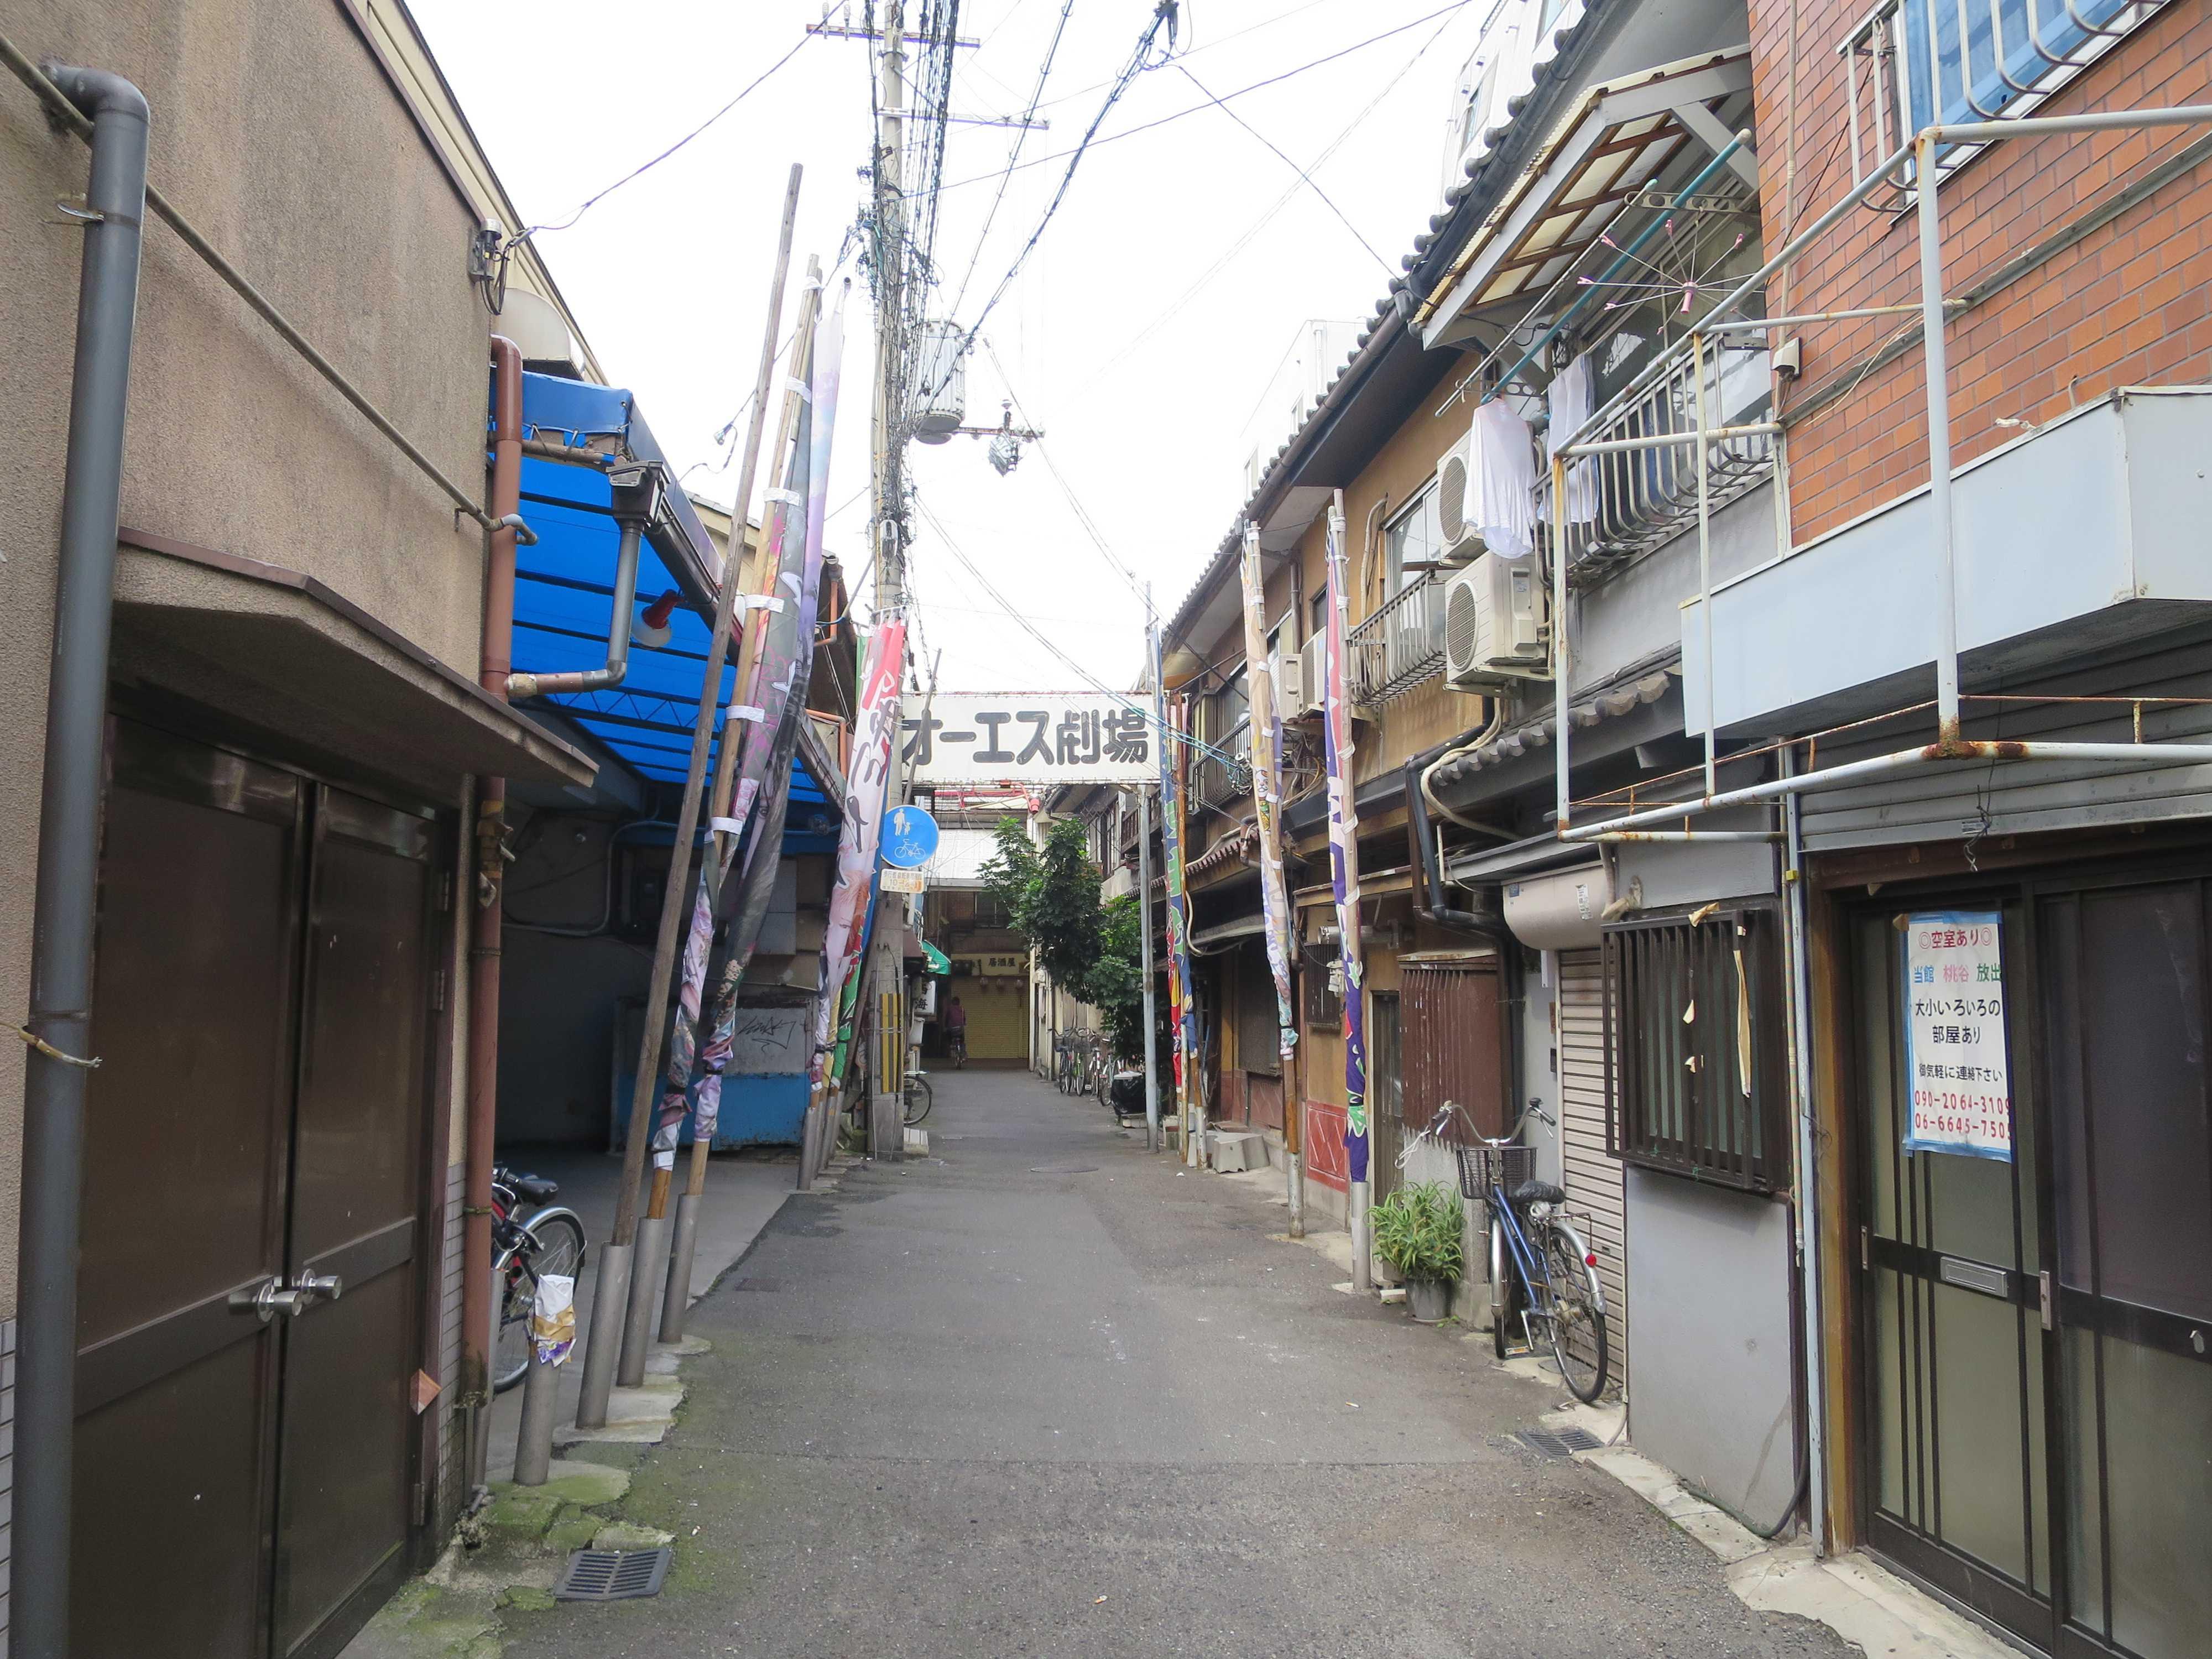 大衆演劇「オーエス劇場」 - 大阪市西成区